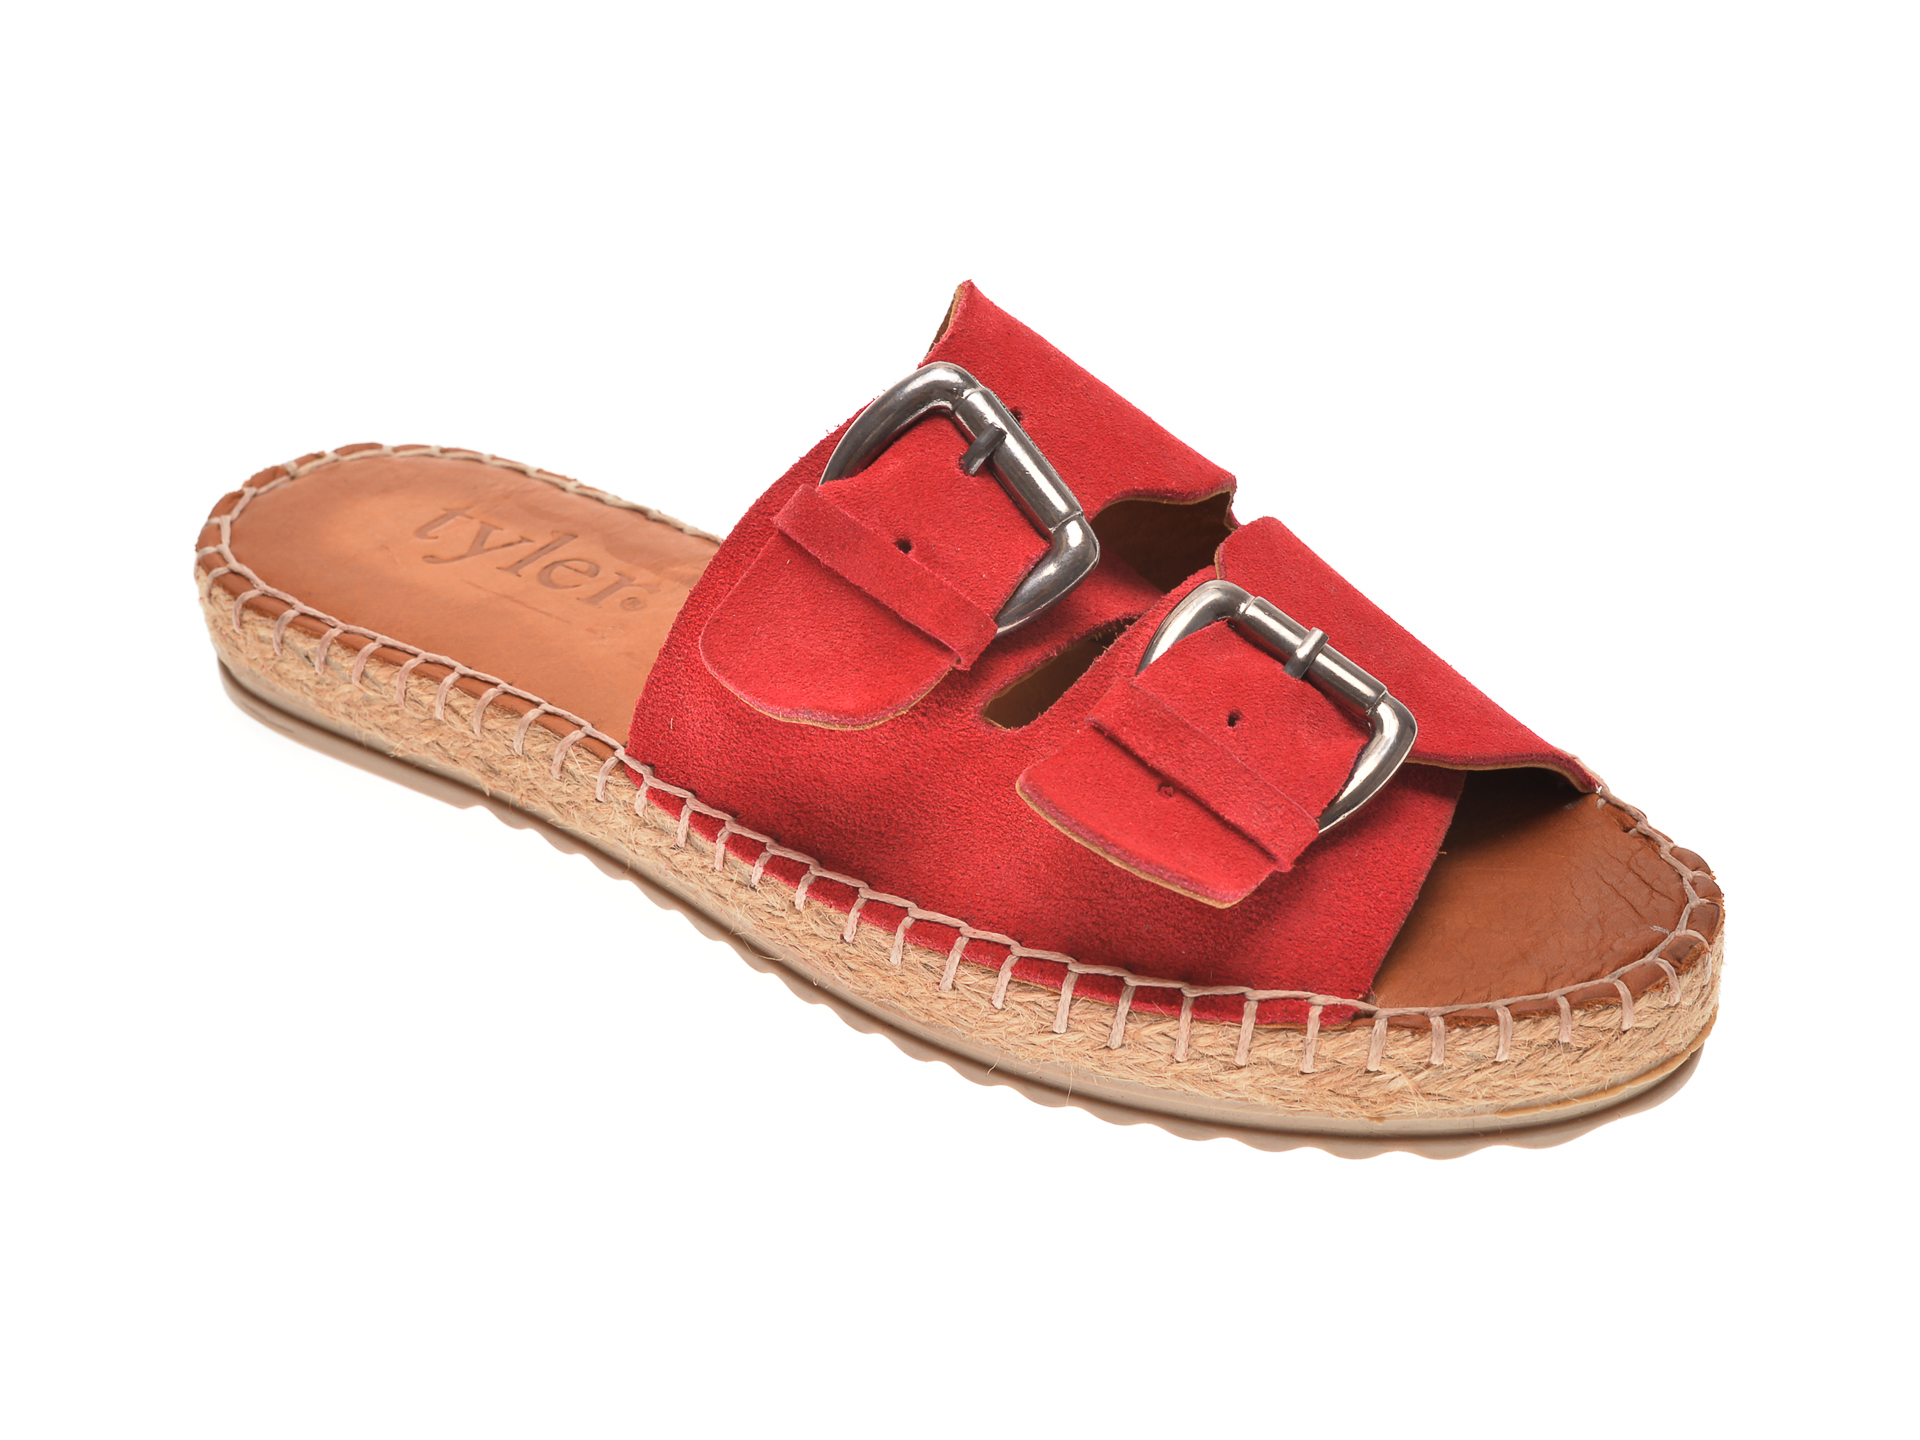 Papuci MESSIMODA rosii, 18Y1158, din piele intoarsa imagine